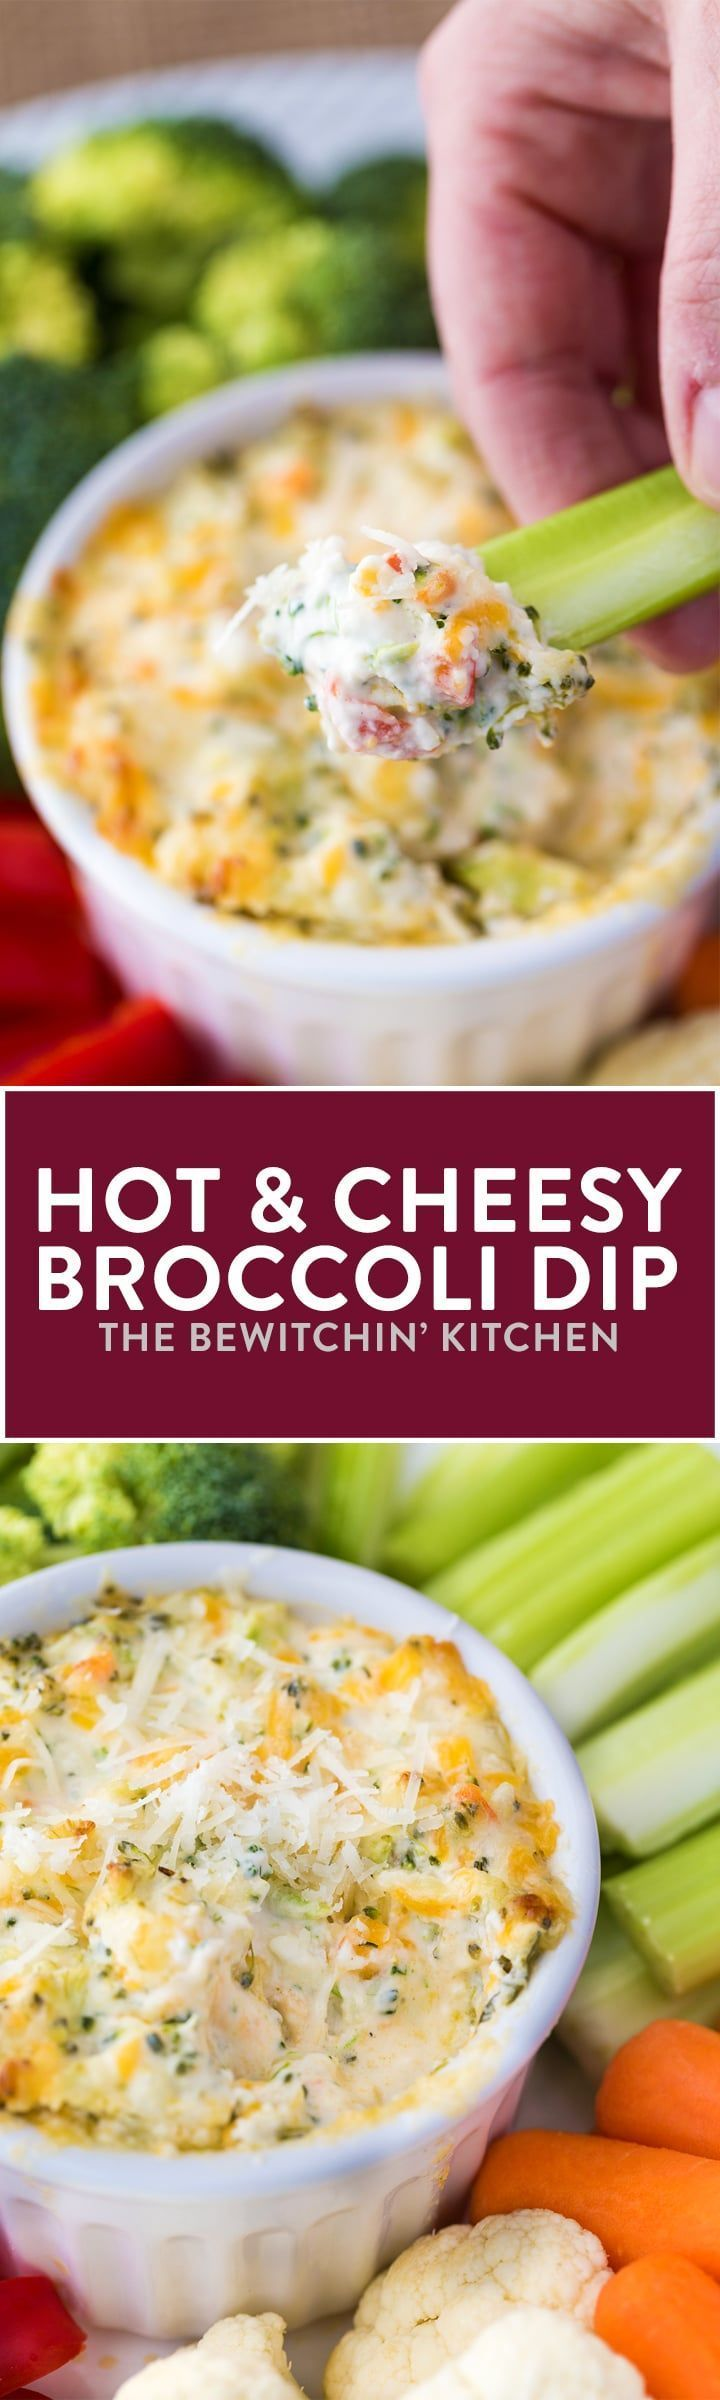 hot broccoli dip rezept appetizer bites pinterest essen creme und rezepte. Black Bedroom Furniture Sets. Home Design Ideas